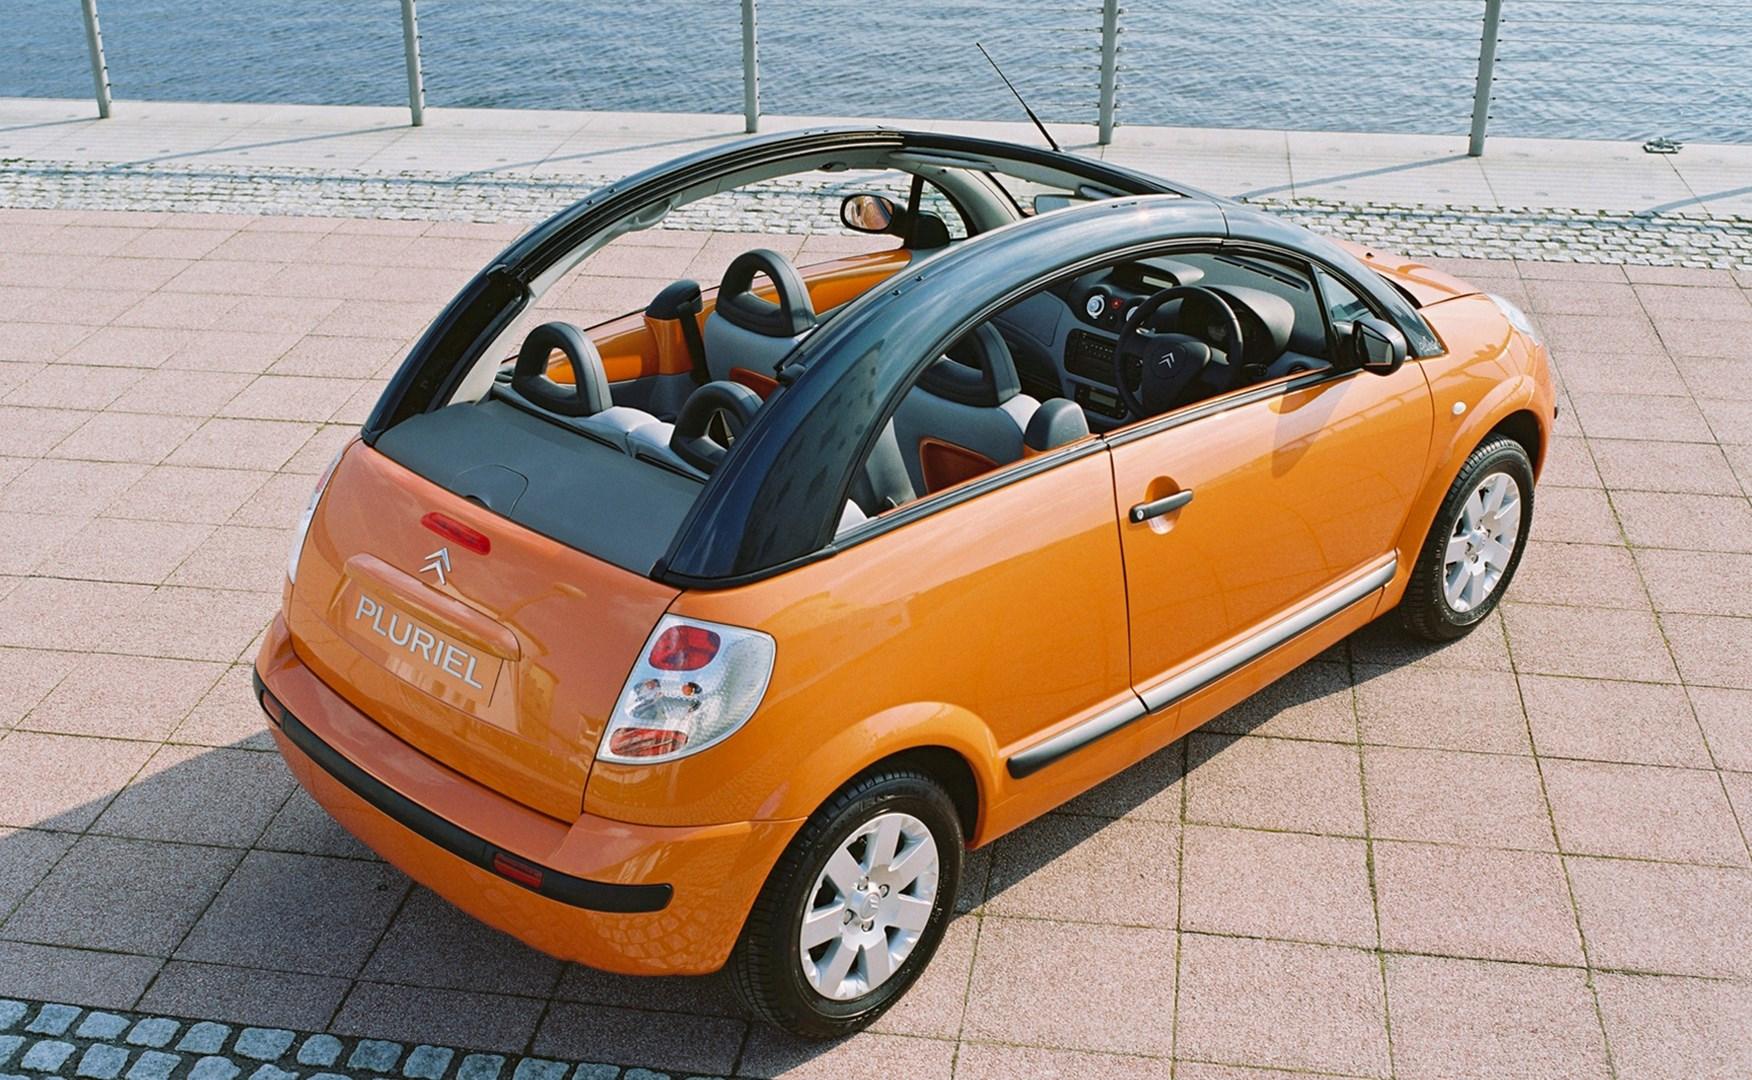 citro n c3 pluriel convertible review 2003 2010 parkers. Black Bedroom Furniture Sets. Home Design Ideas